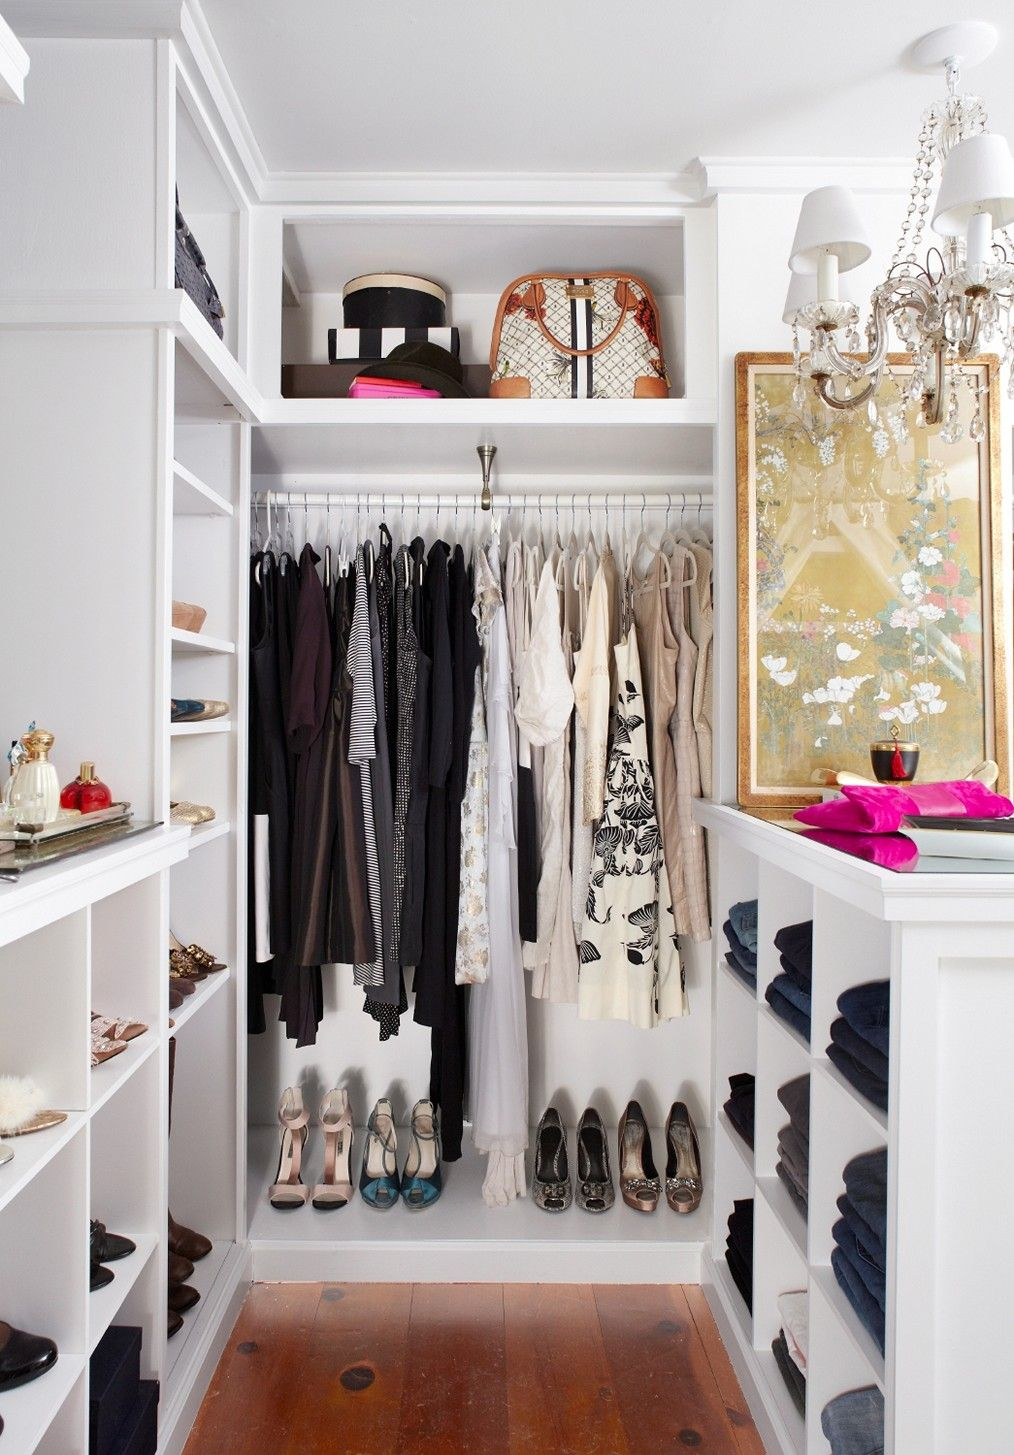 6 Walk Closet Gorgeous Ideas Tips To Make Your Closet Like High